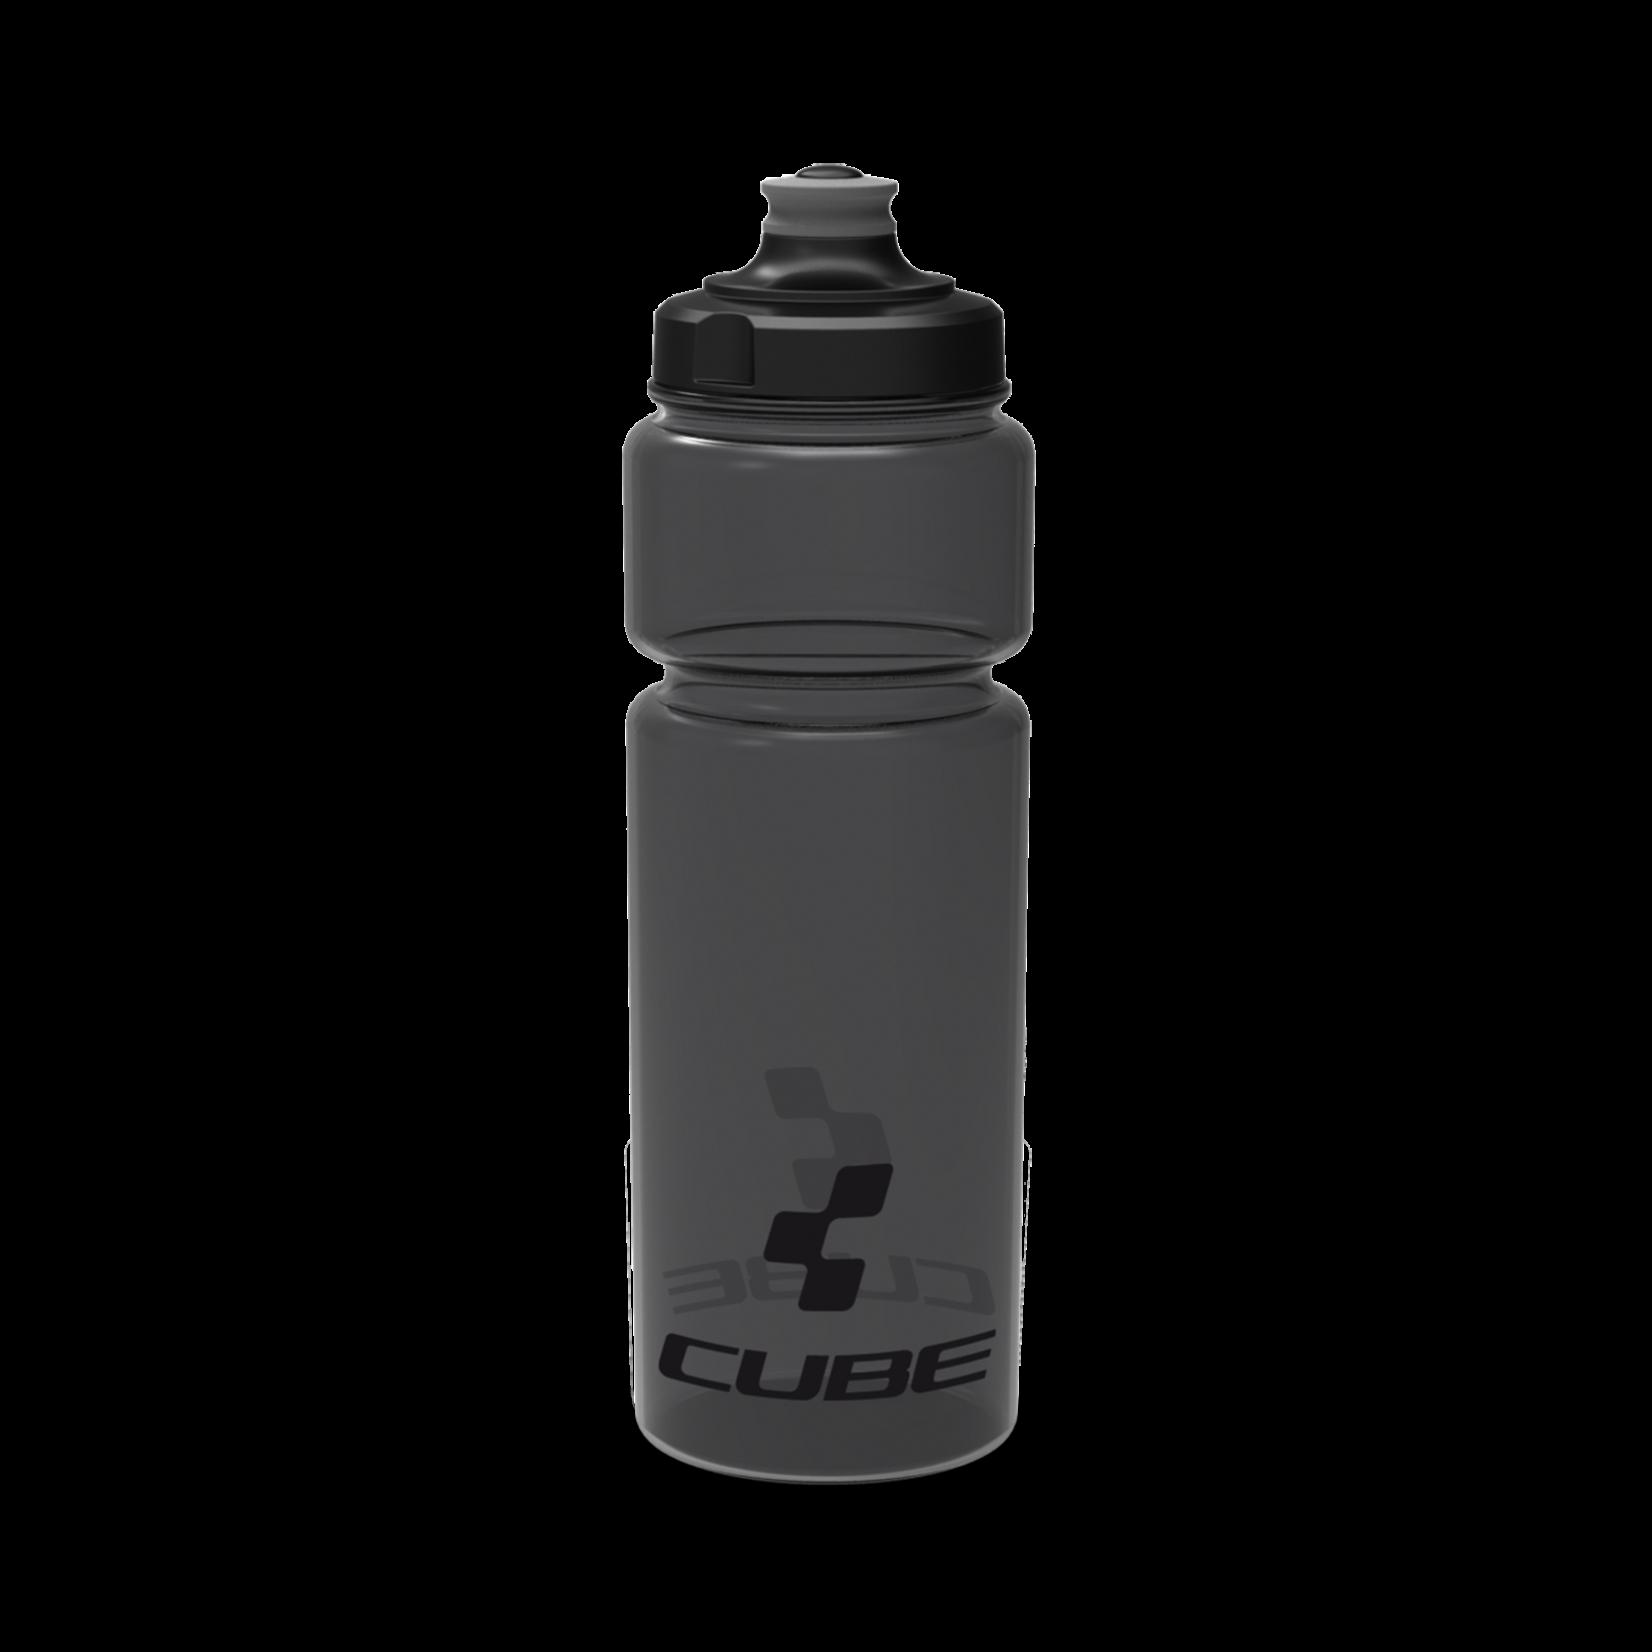 Cube CUBE Icon Bidon 0.75l - Black